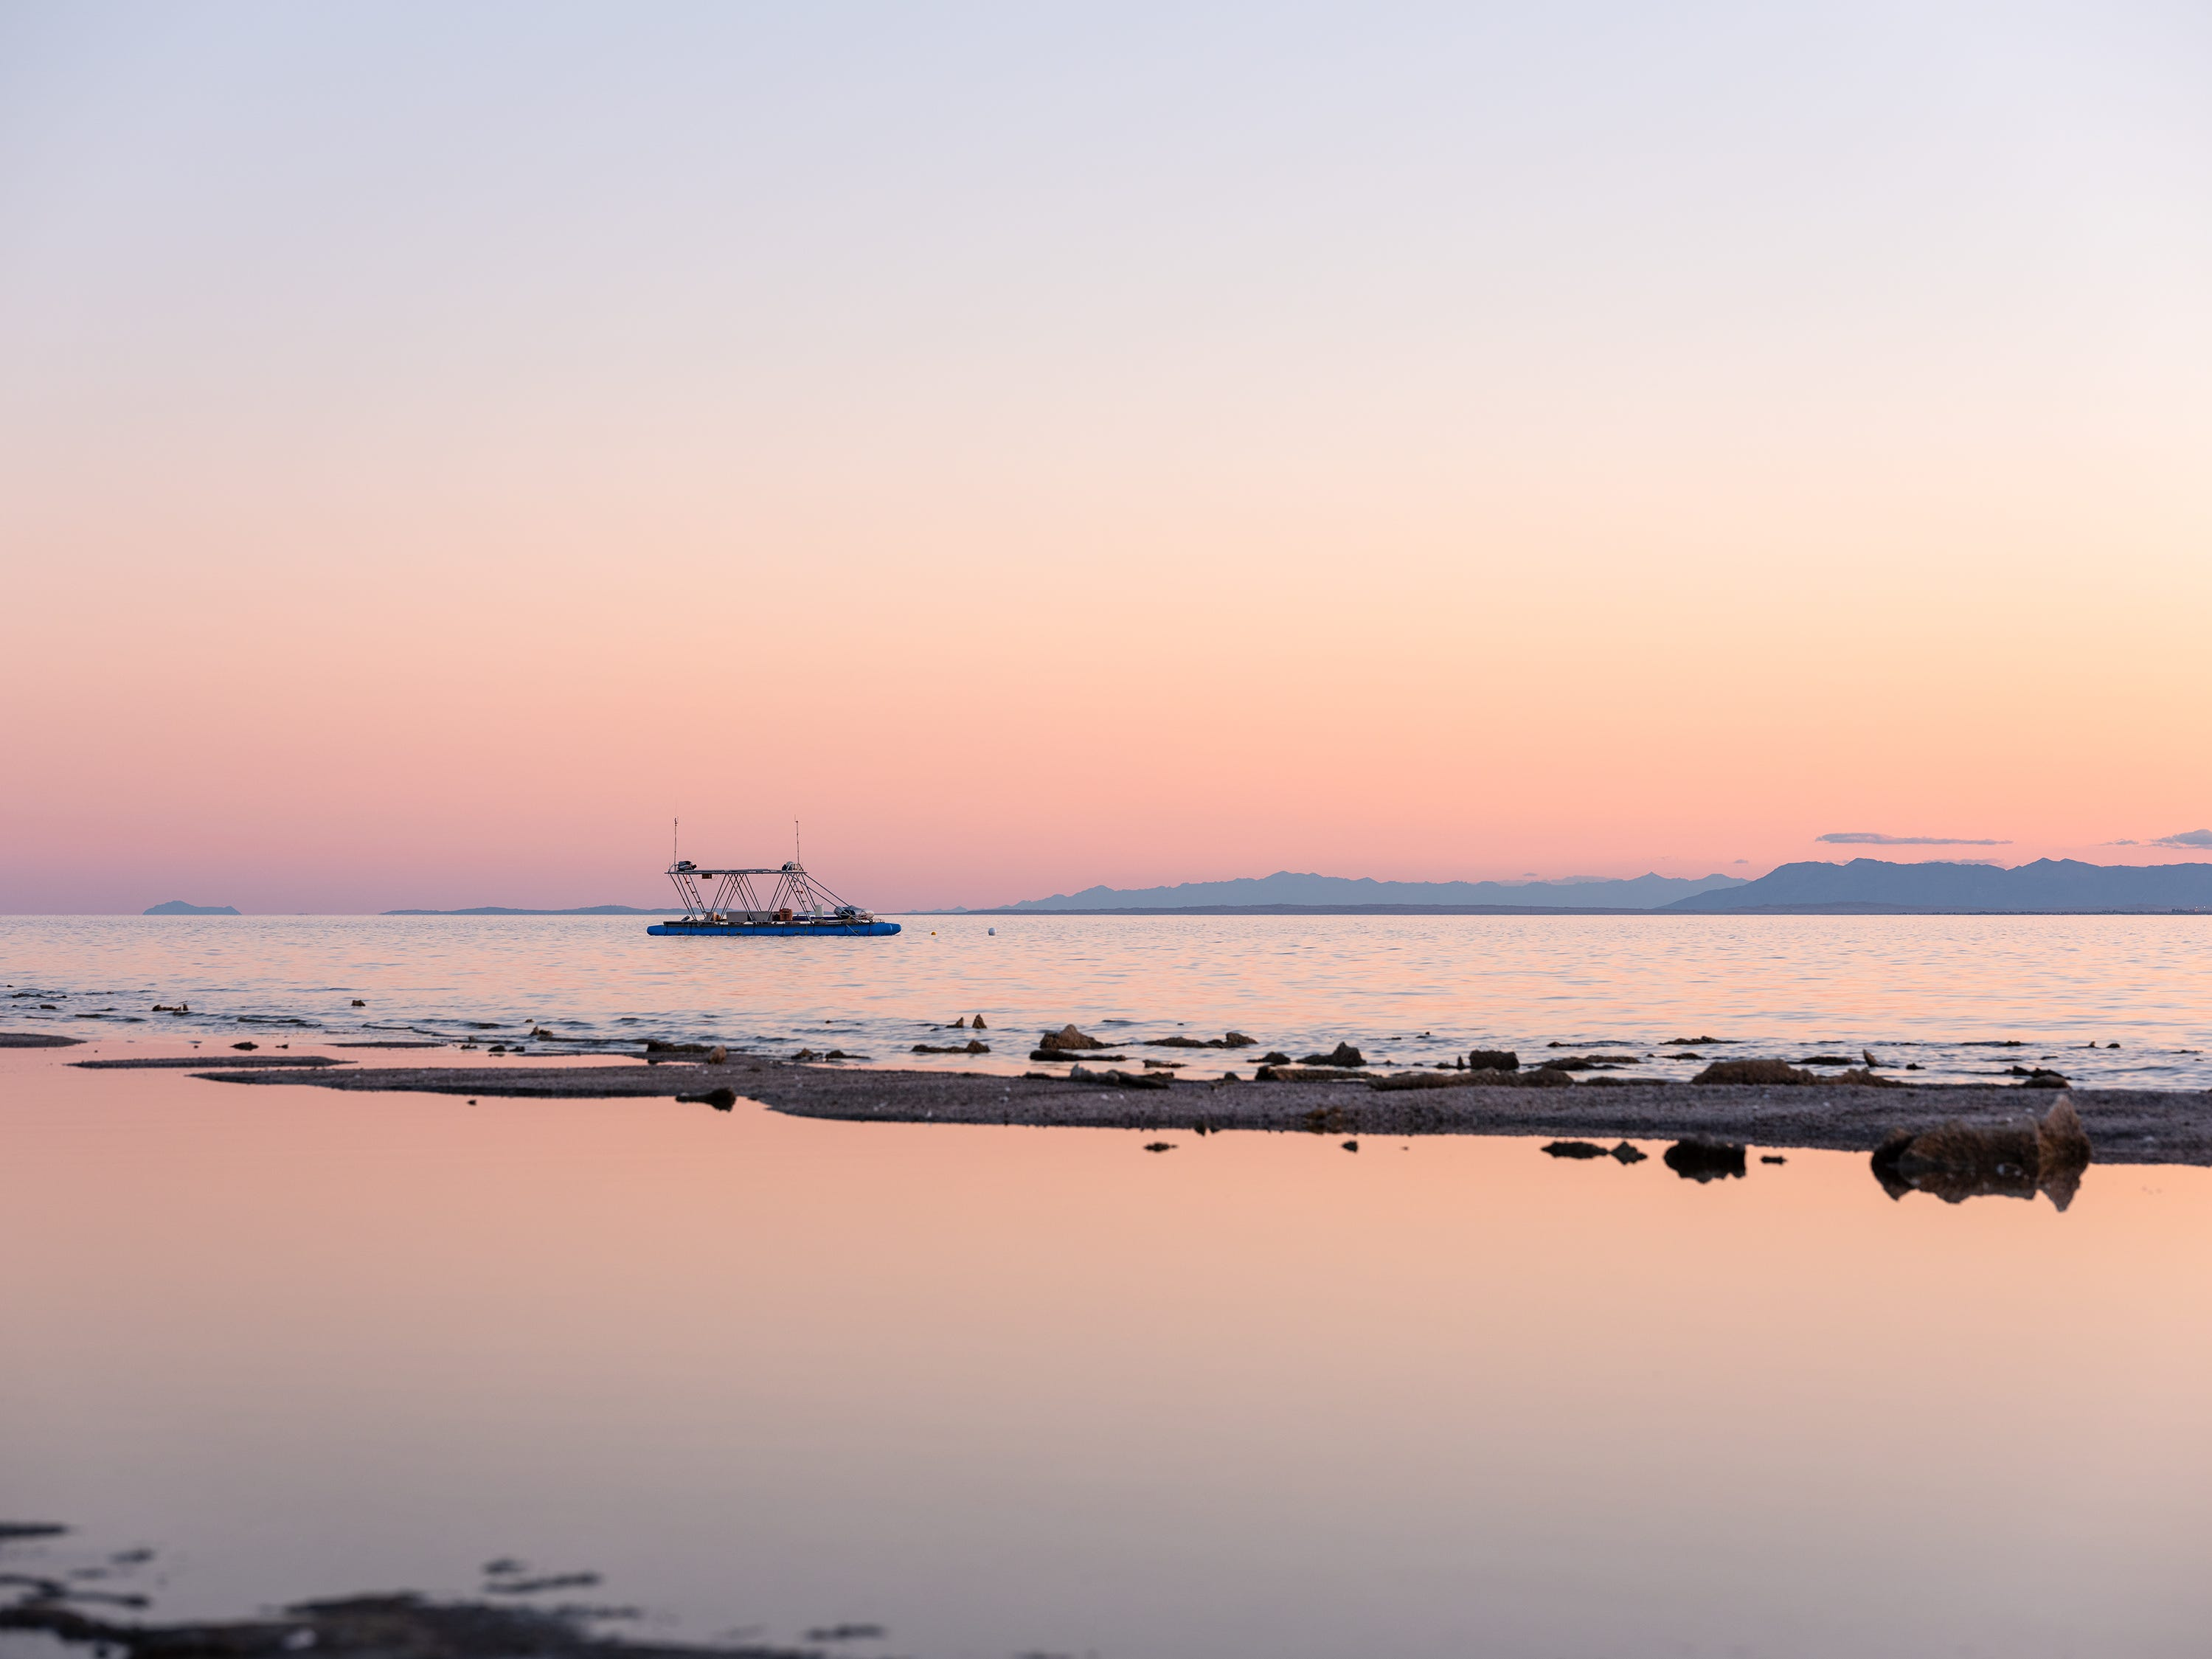 """Terminal Lake Exploration Platform"" by Chris Taylor and Steve Badgett for Desert X 2019"